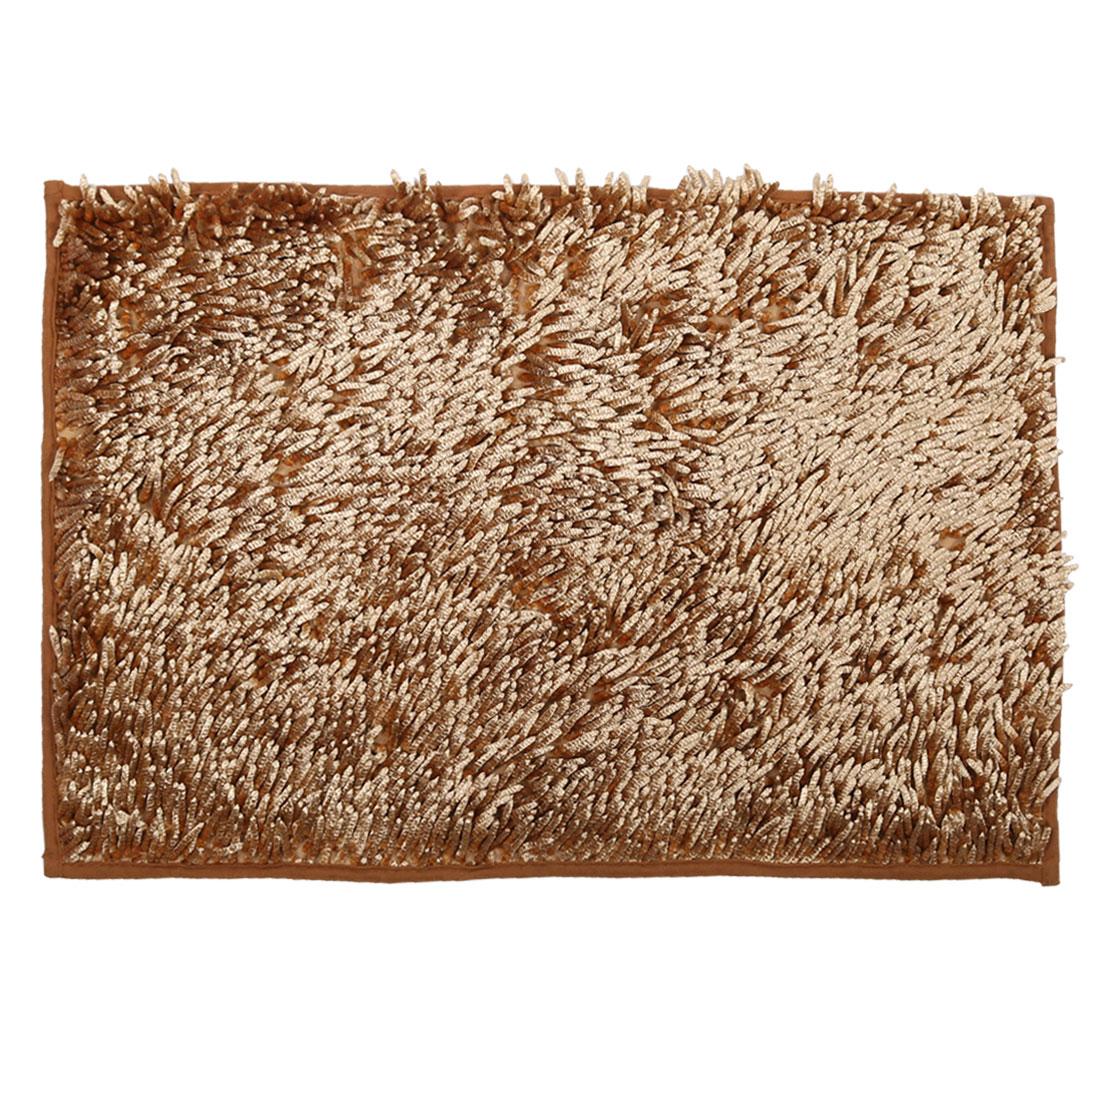 Home Bathroom Non Slip Absorbent Bath Rug Mat Carpet Light Brown 32 x 20 Inches